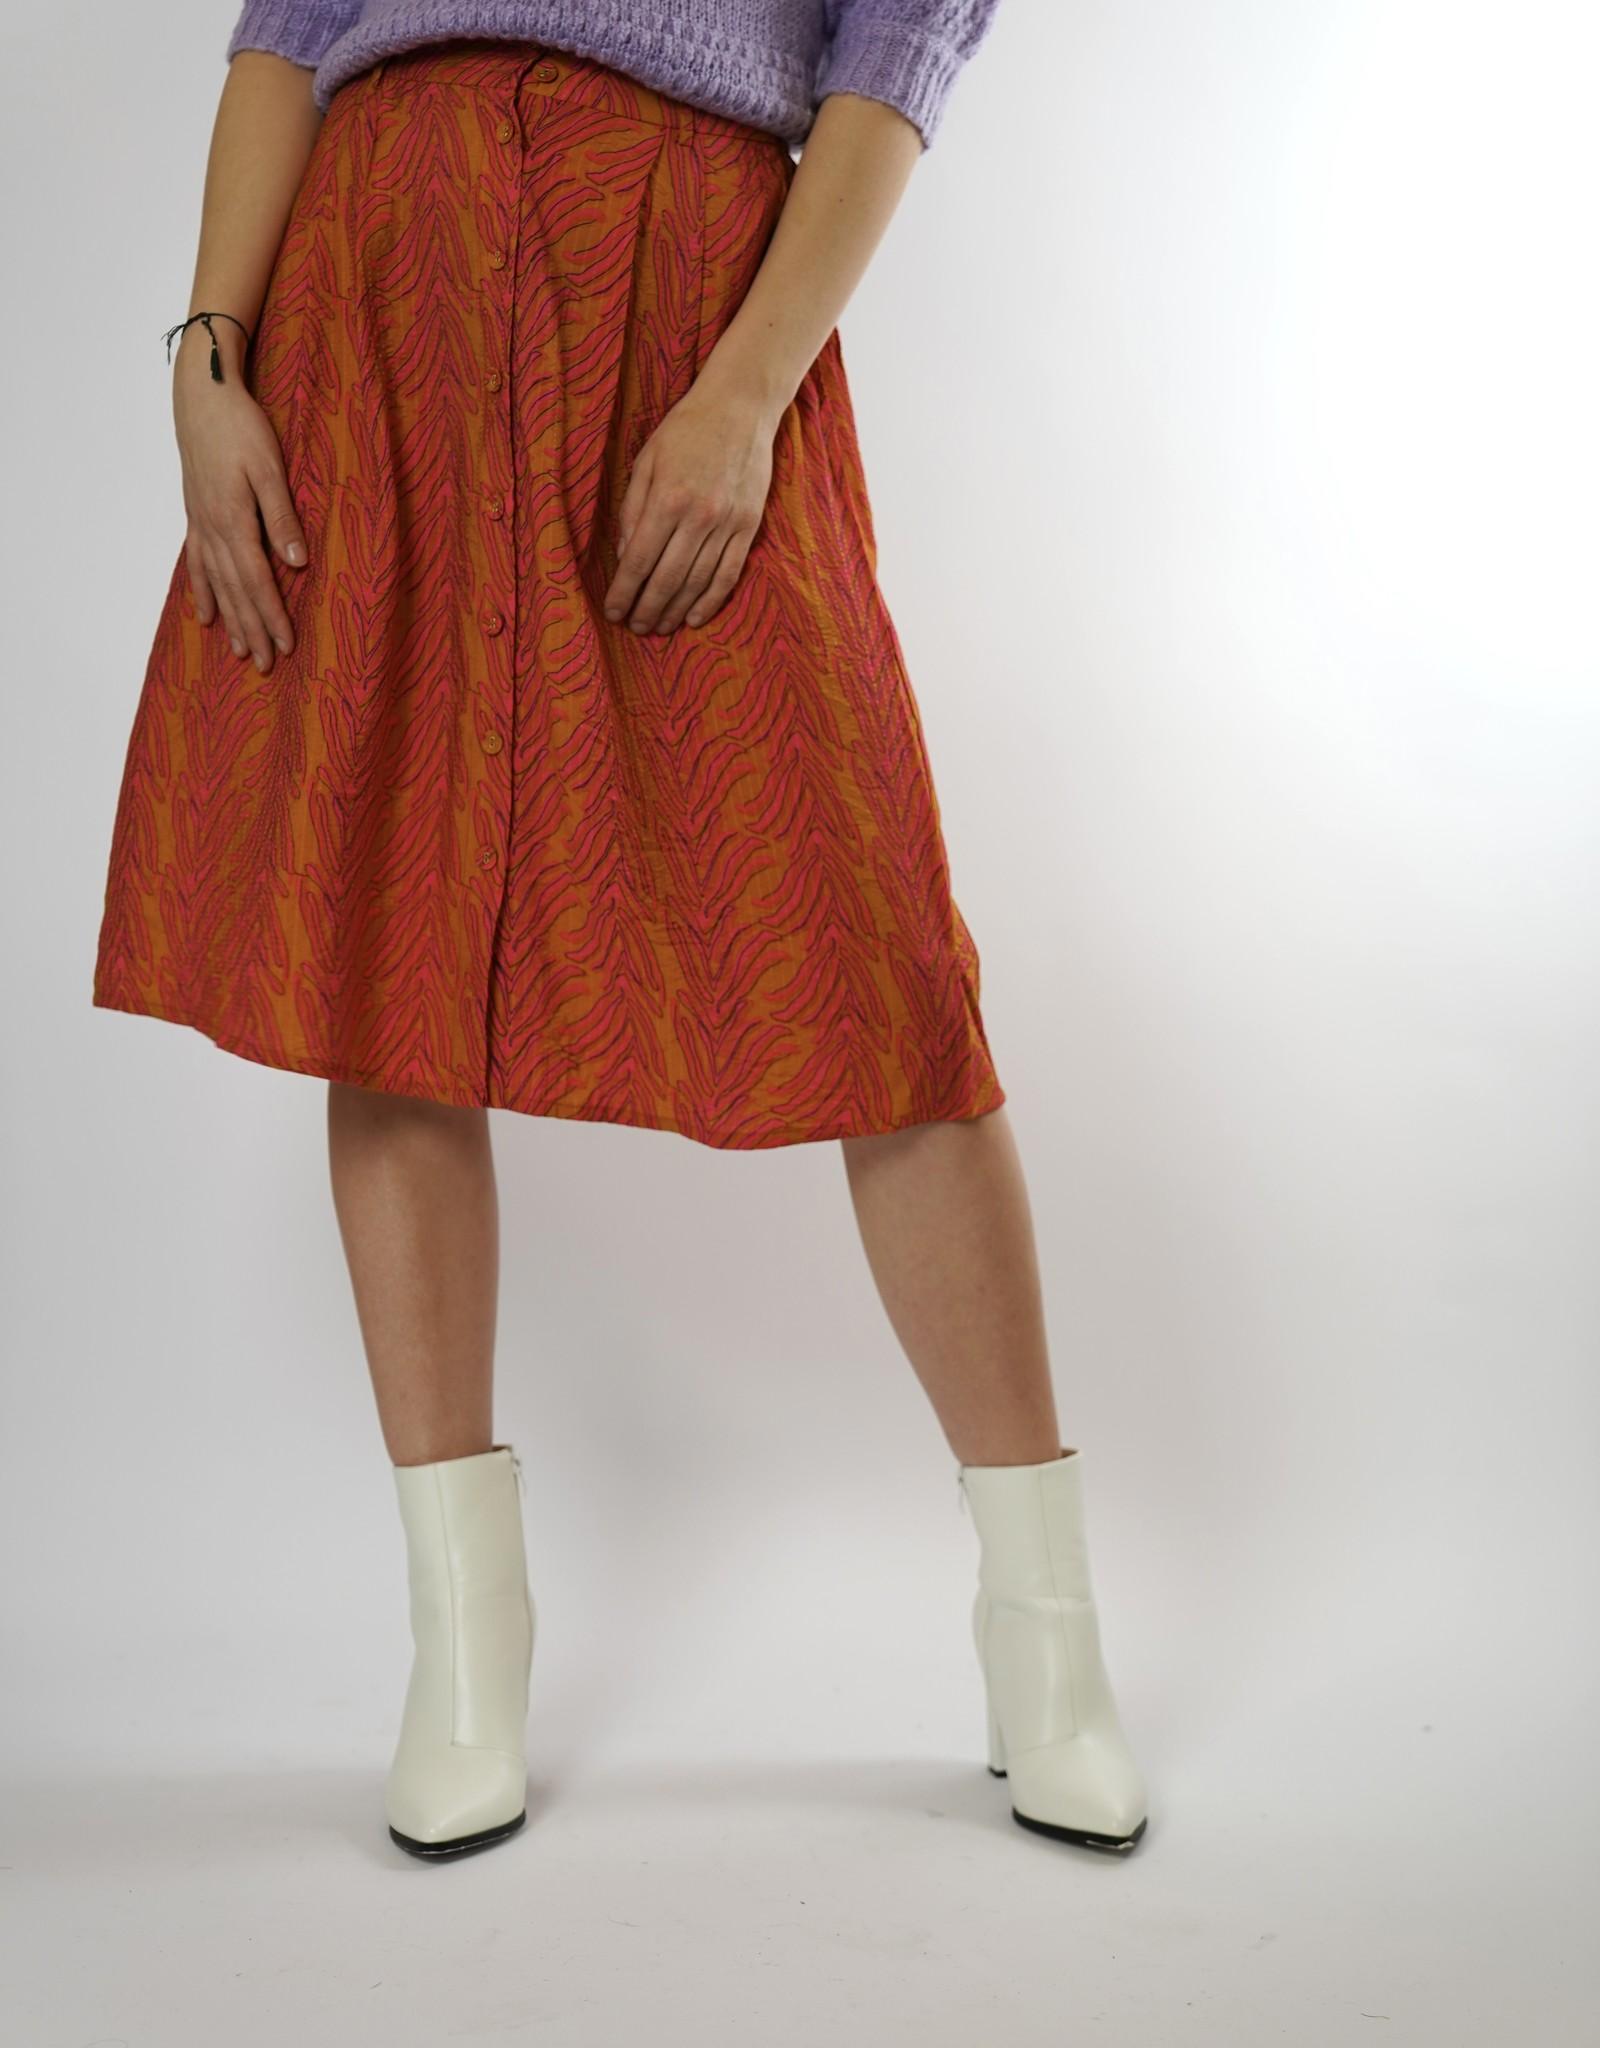 FRNCH FRNCH -Elyette Skirt